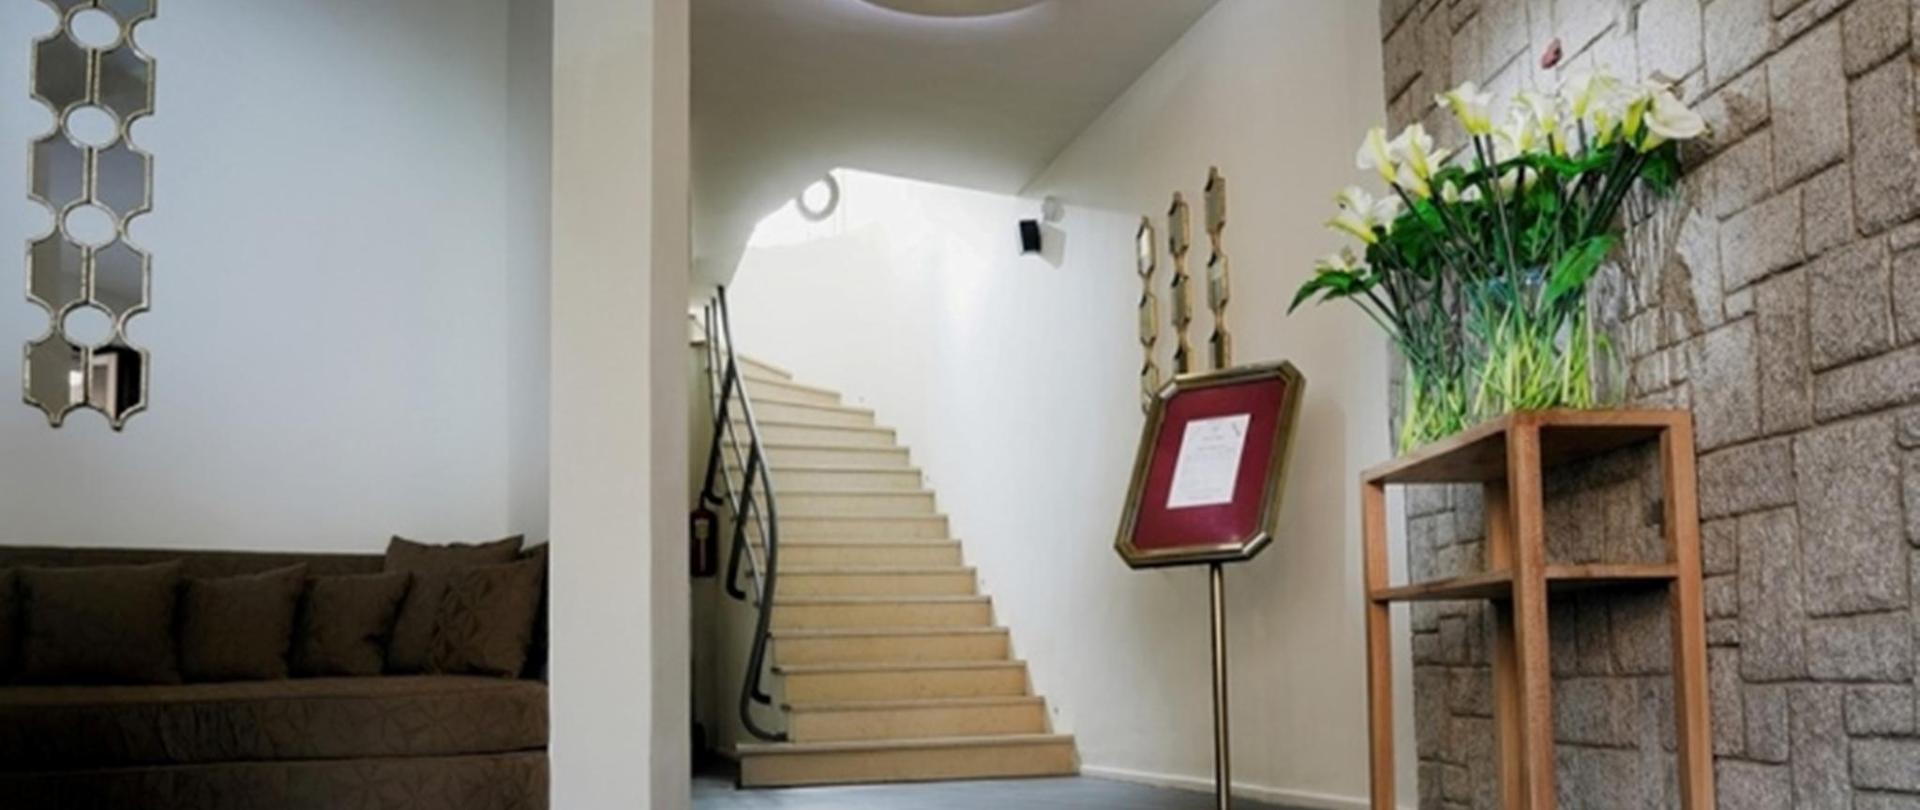 0001_Hotel La Villette Isoraka_17-10-13.jpg